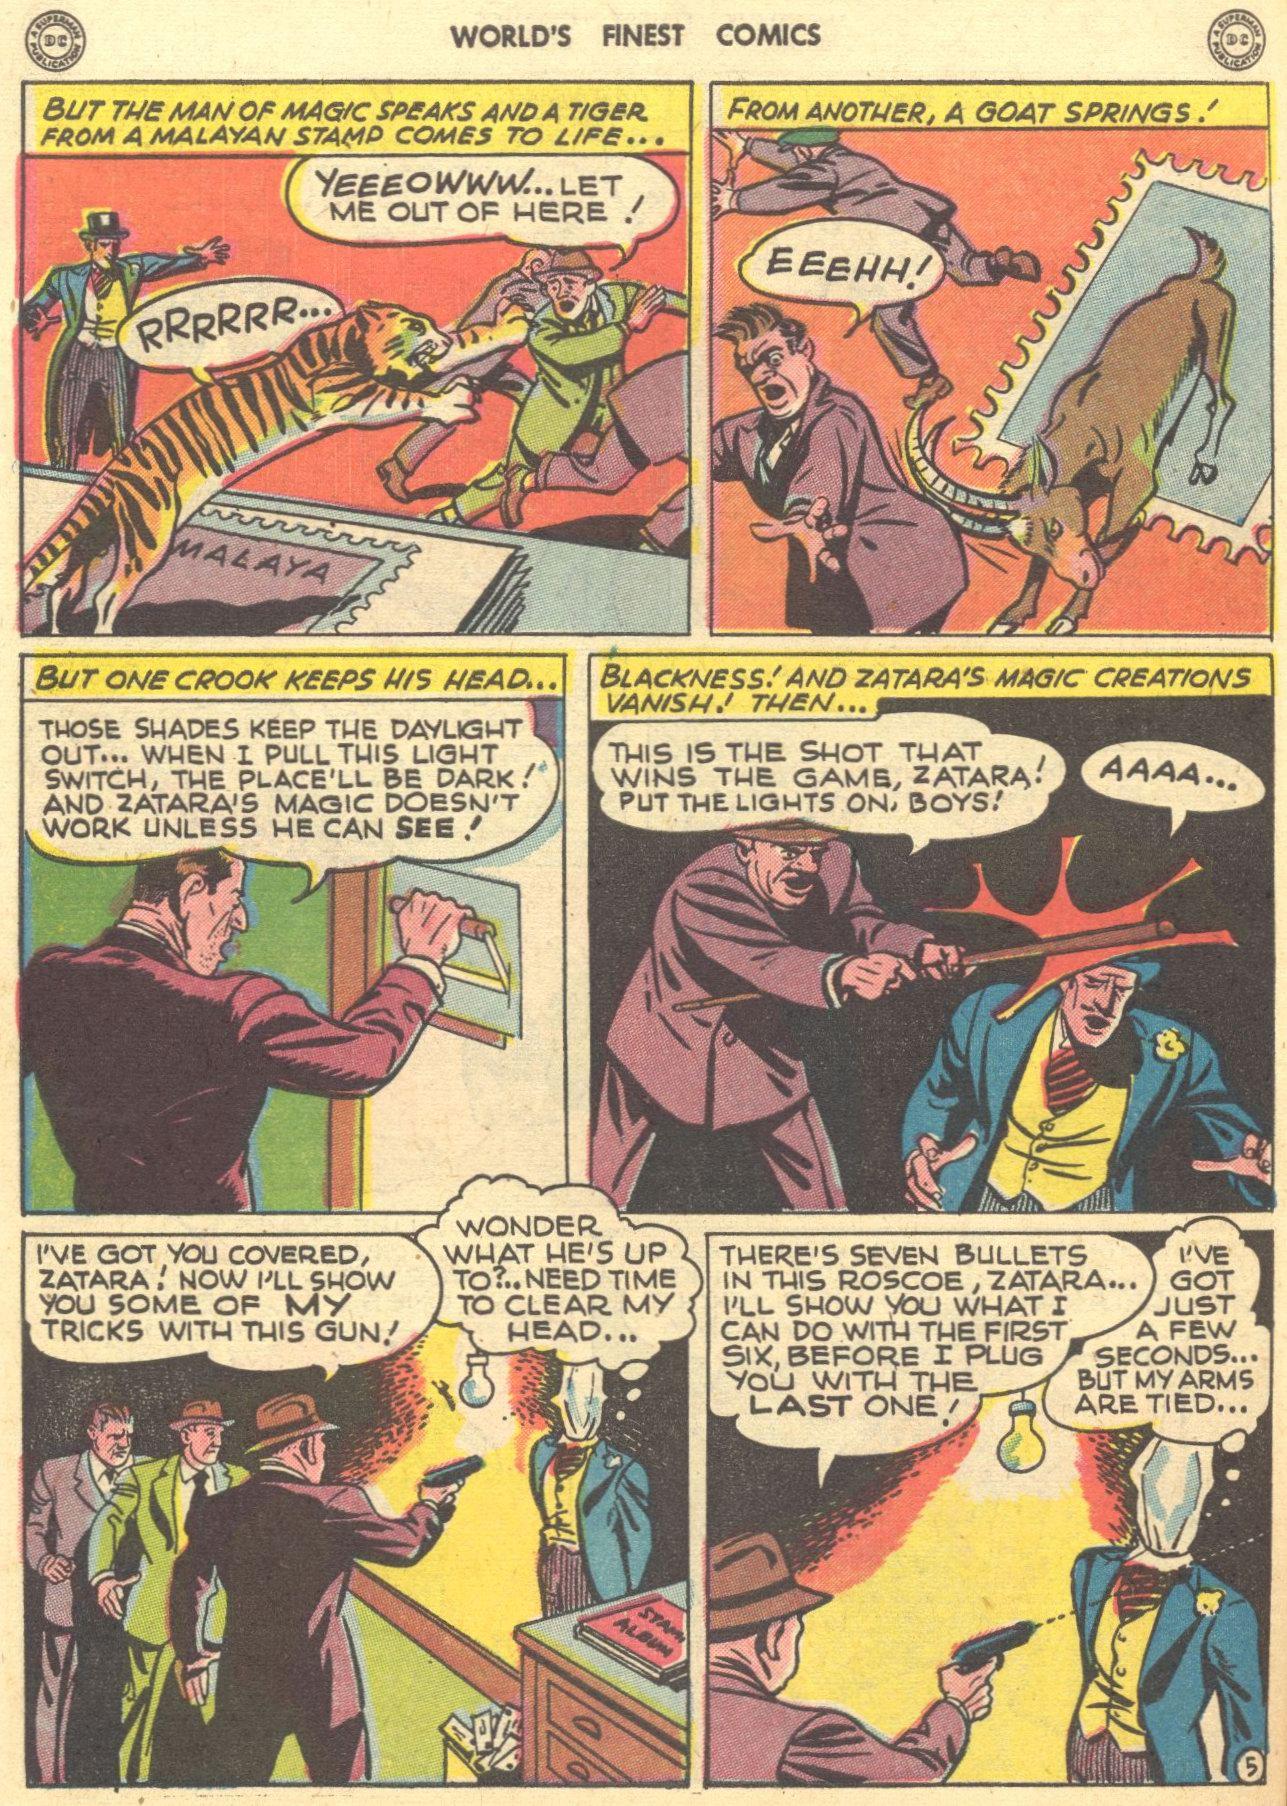 Read online World's Finest Comics comic -  Issue #28 - 47